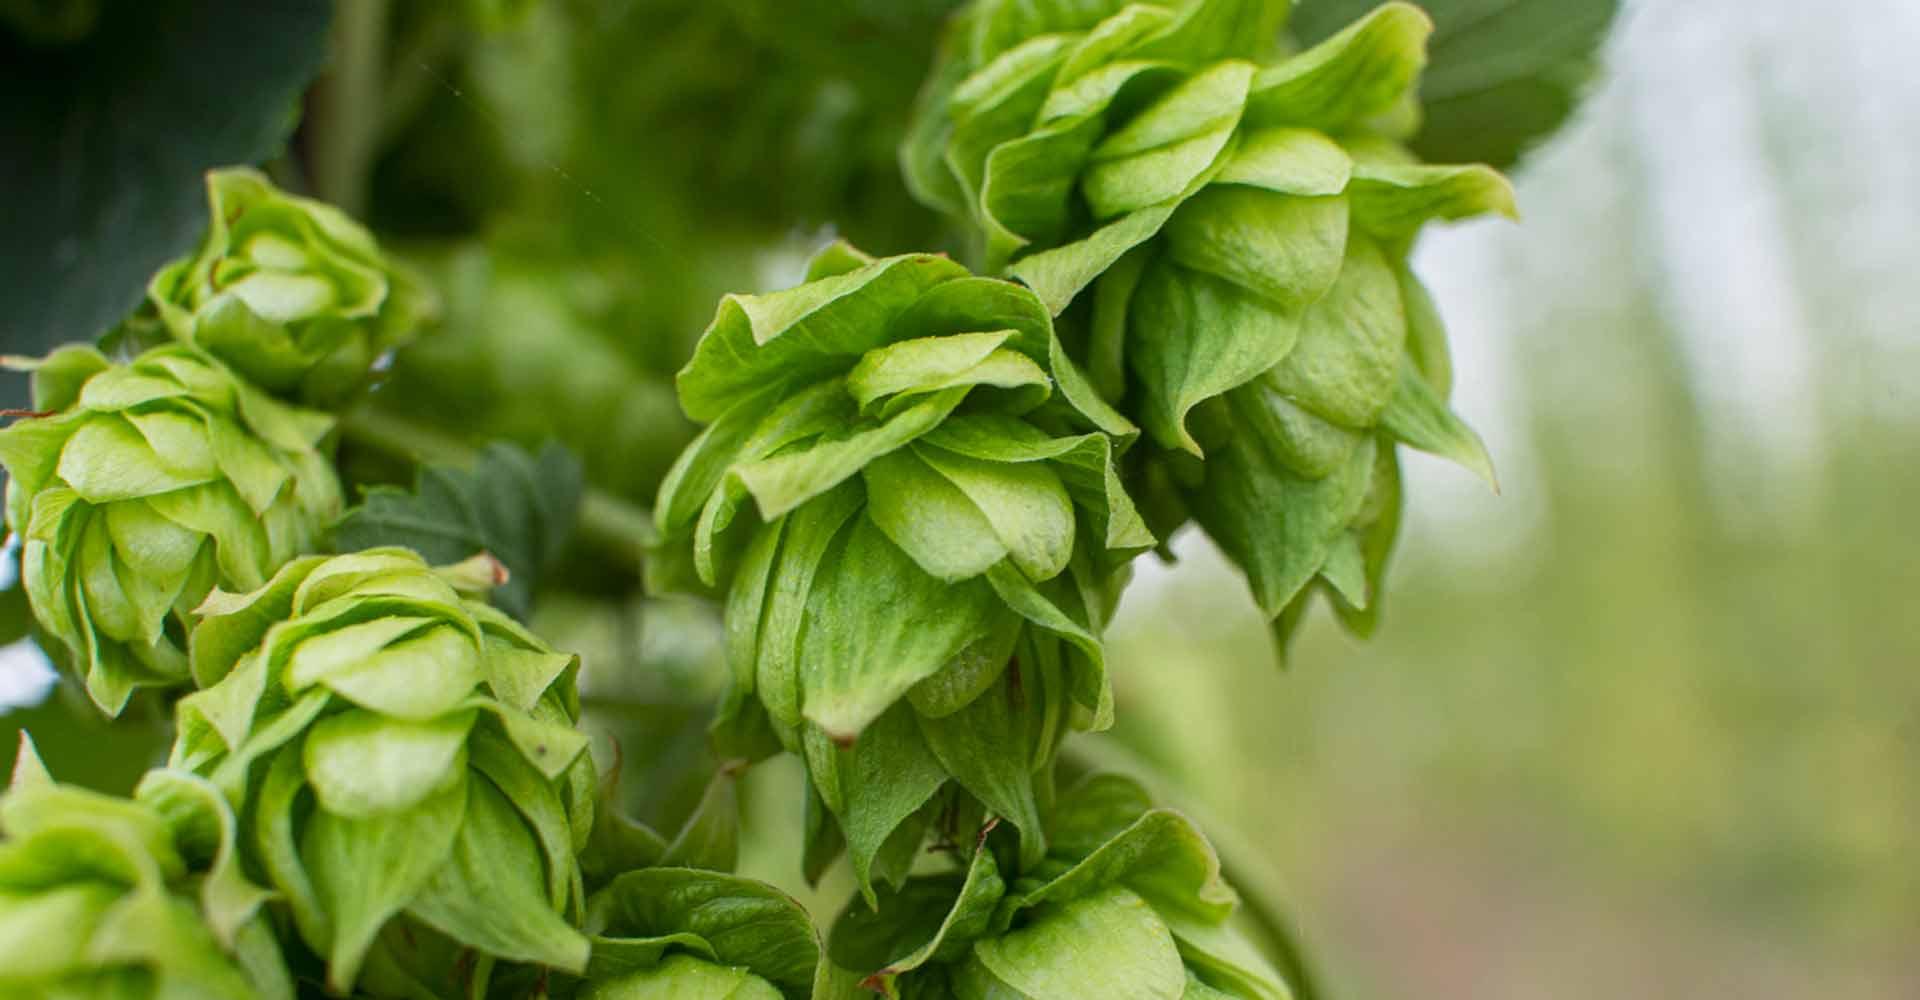 https://www.birrificiomarduk.com/wp-content/uploads/2020/06/01a1-marduk-brewery-agricoltura-filiera-materie-prime-birrificio-birre.jpg